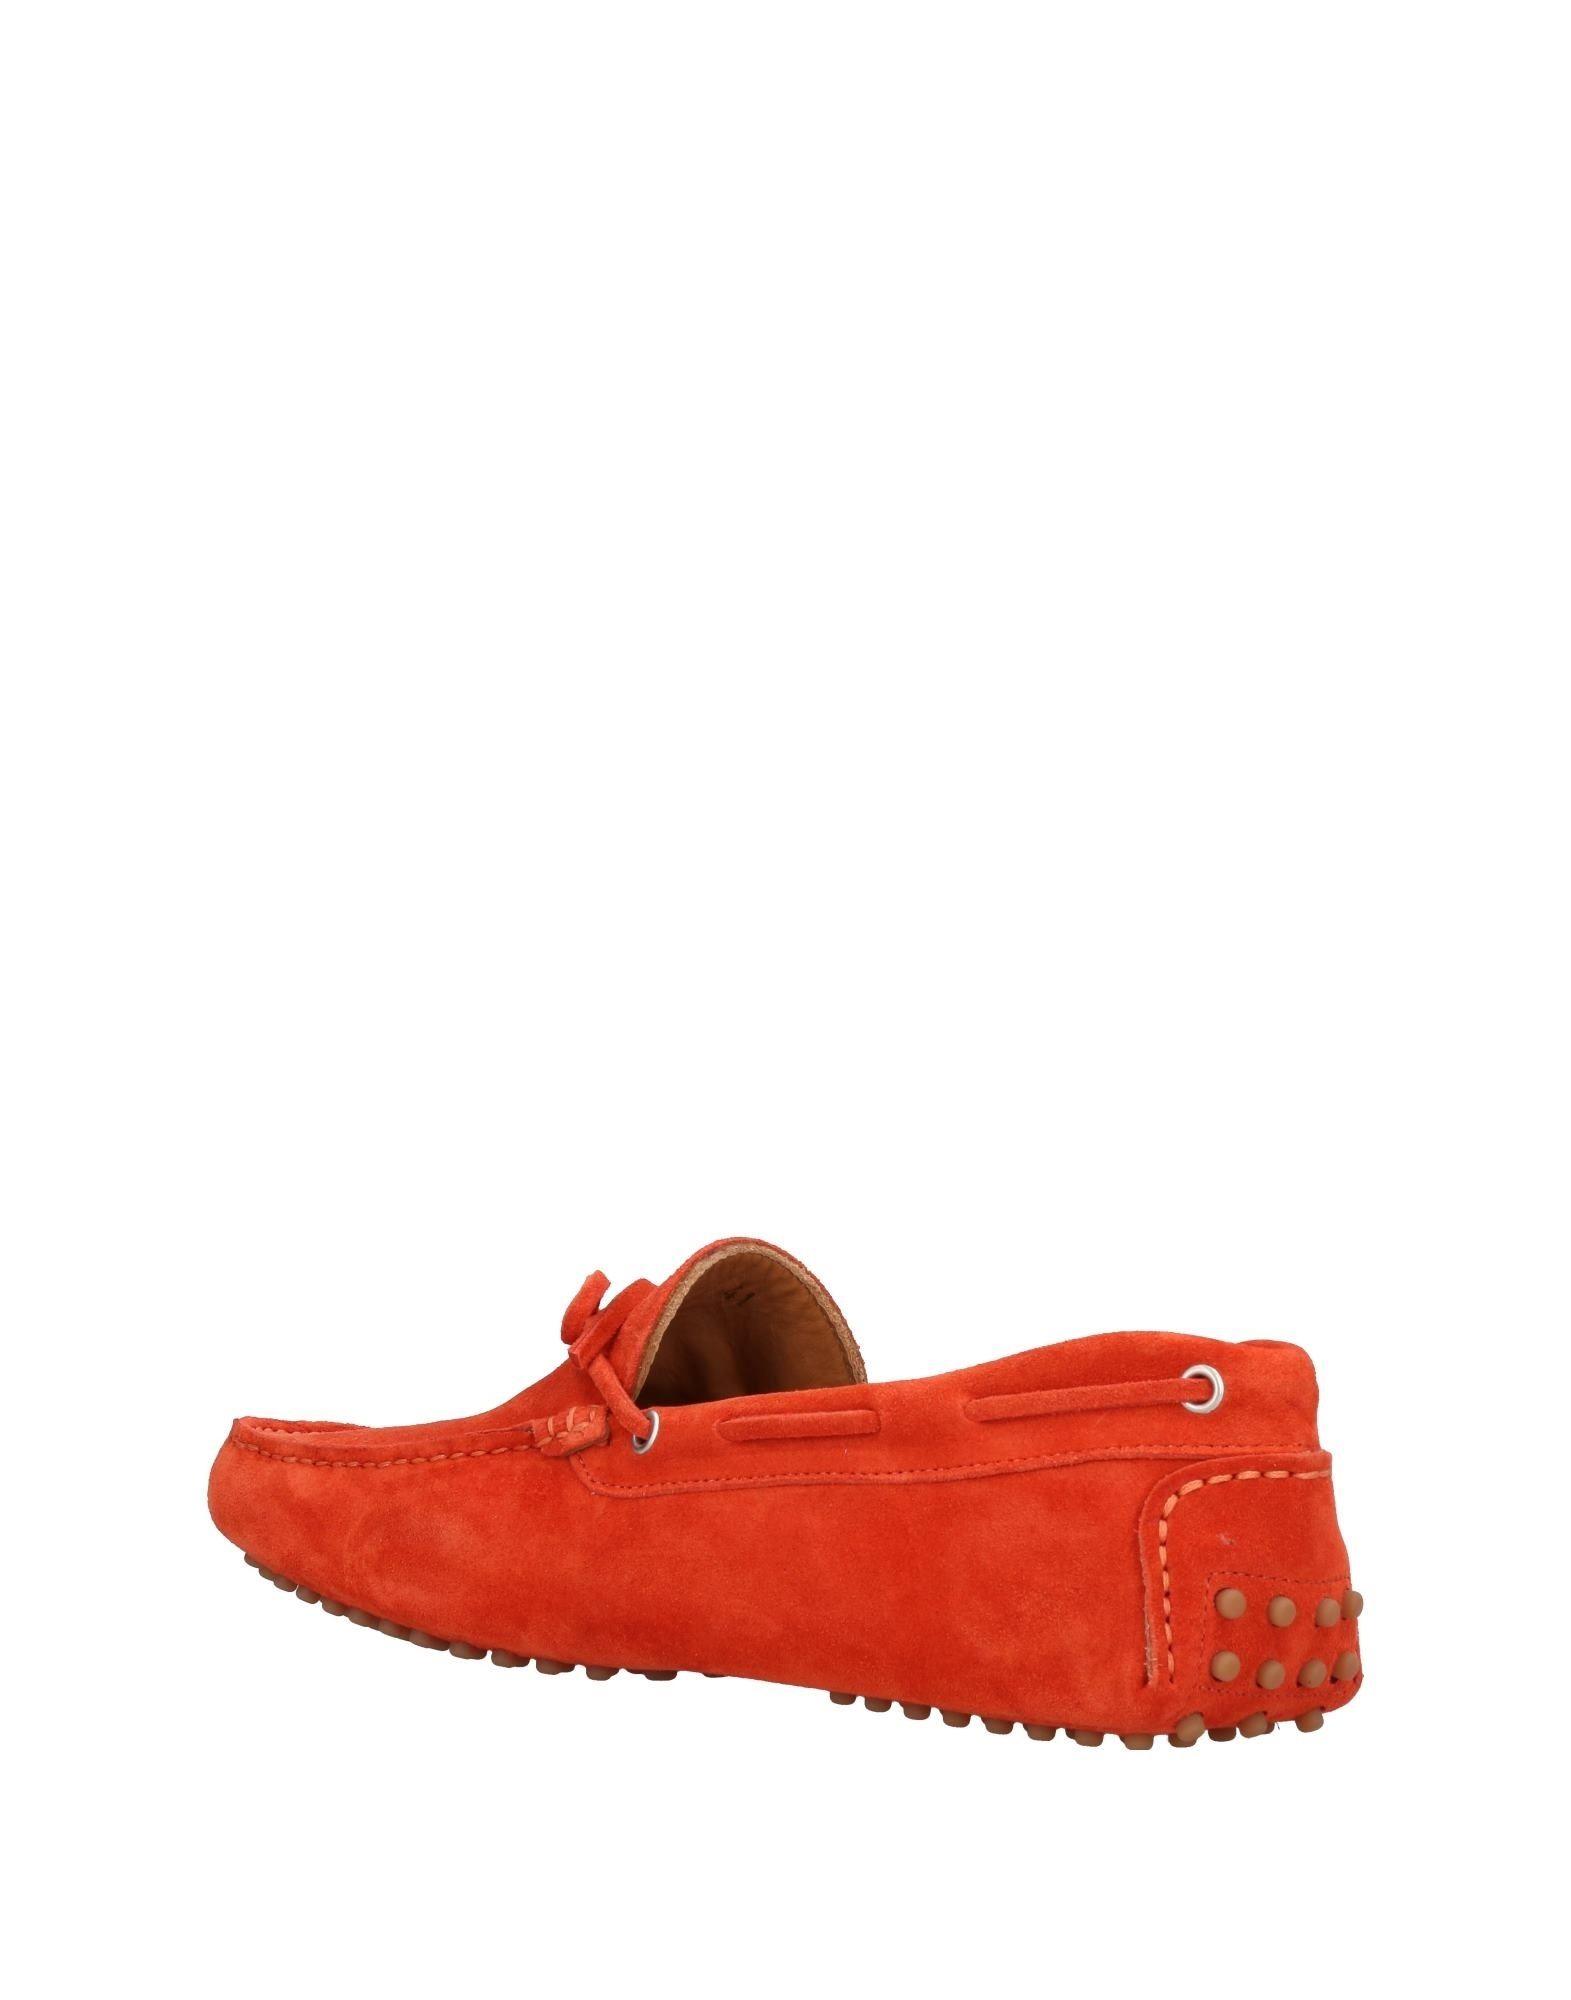 Joyks Mokassins Herren  Schuhe 11415315OO Heiße Schuhe  40c623